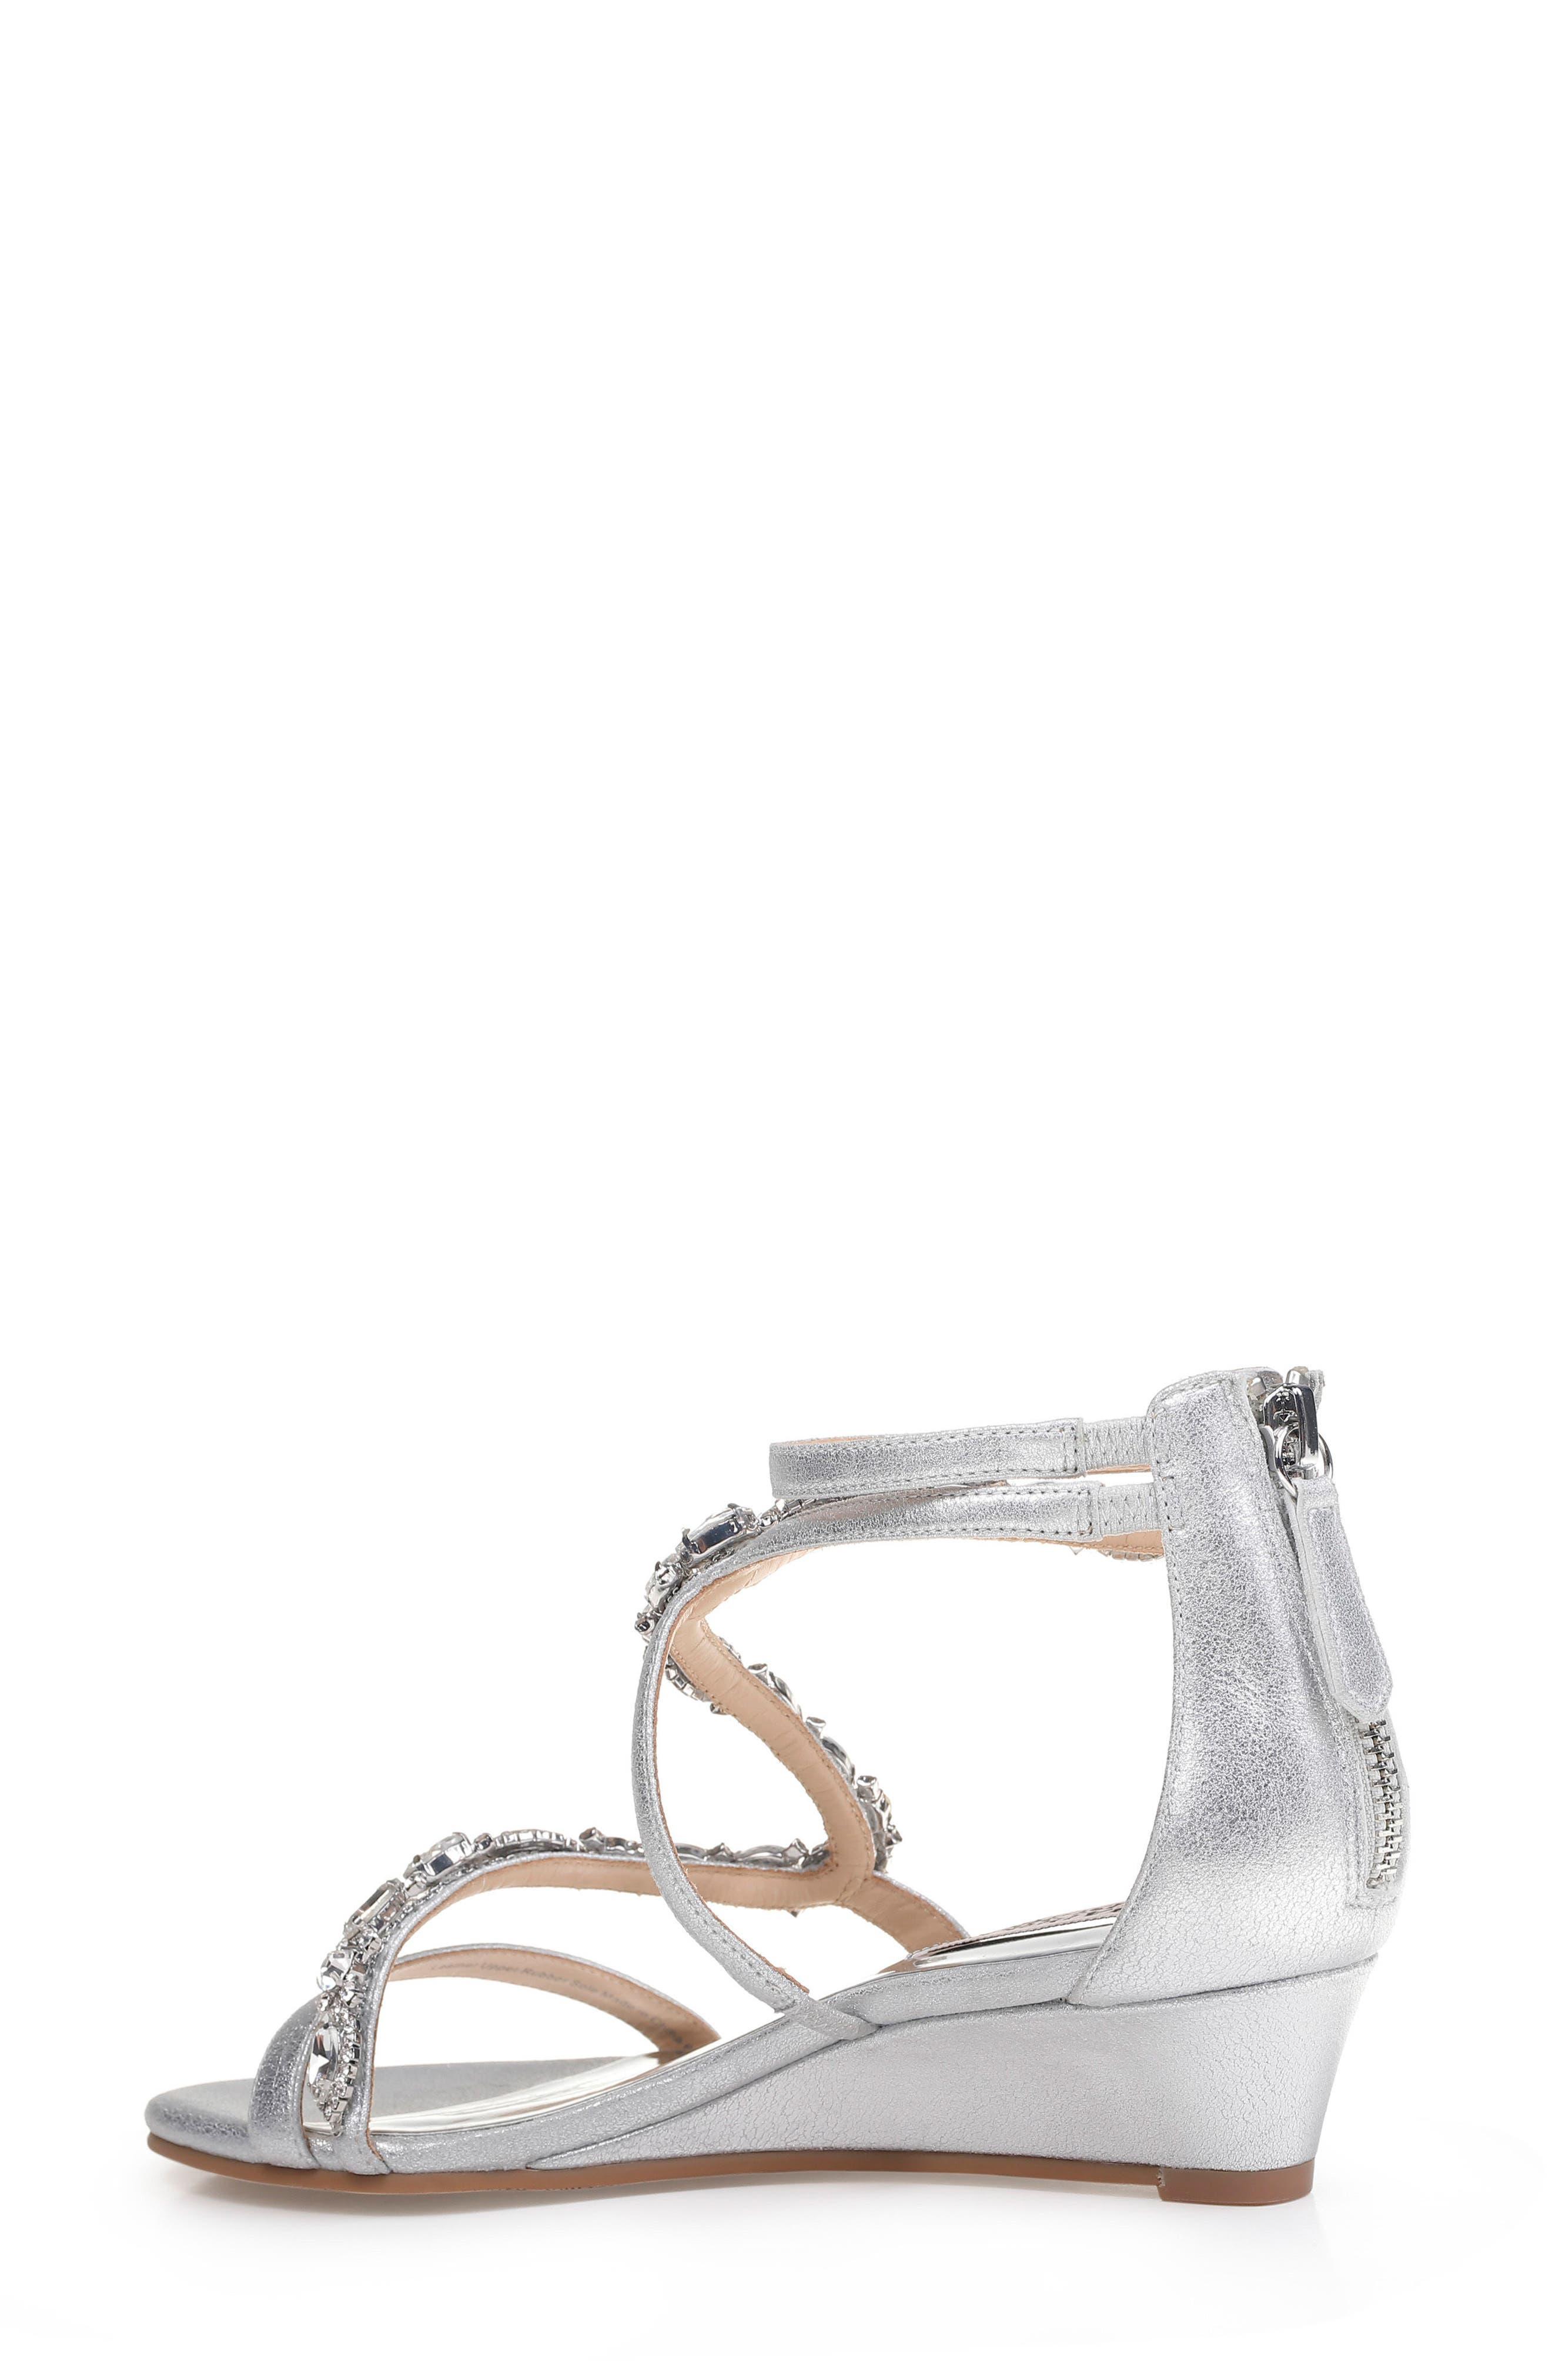 Alternate Image 2  - Badgley Mischka Sierra Strappy Wedge Sandal (Women)